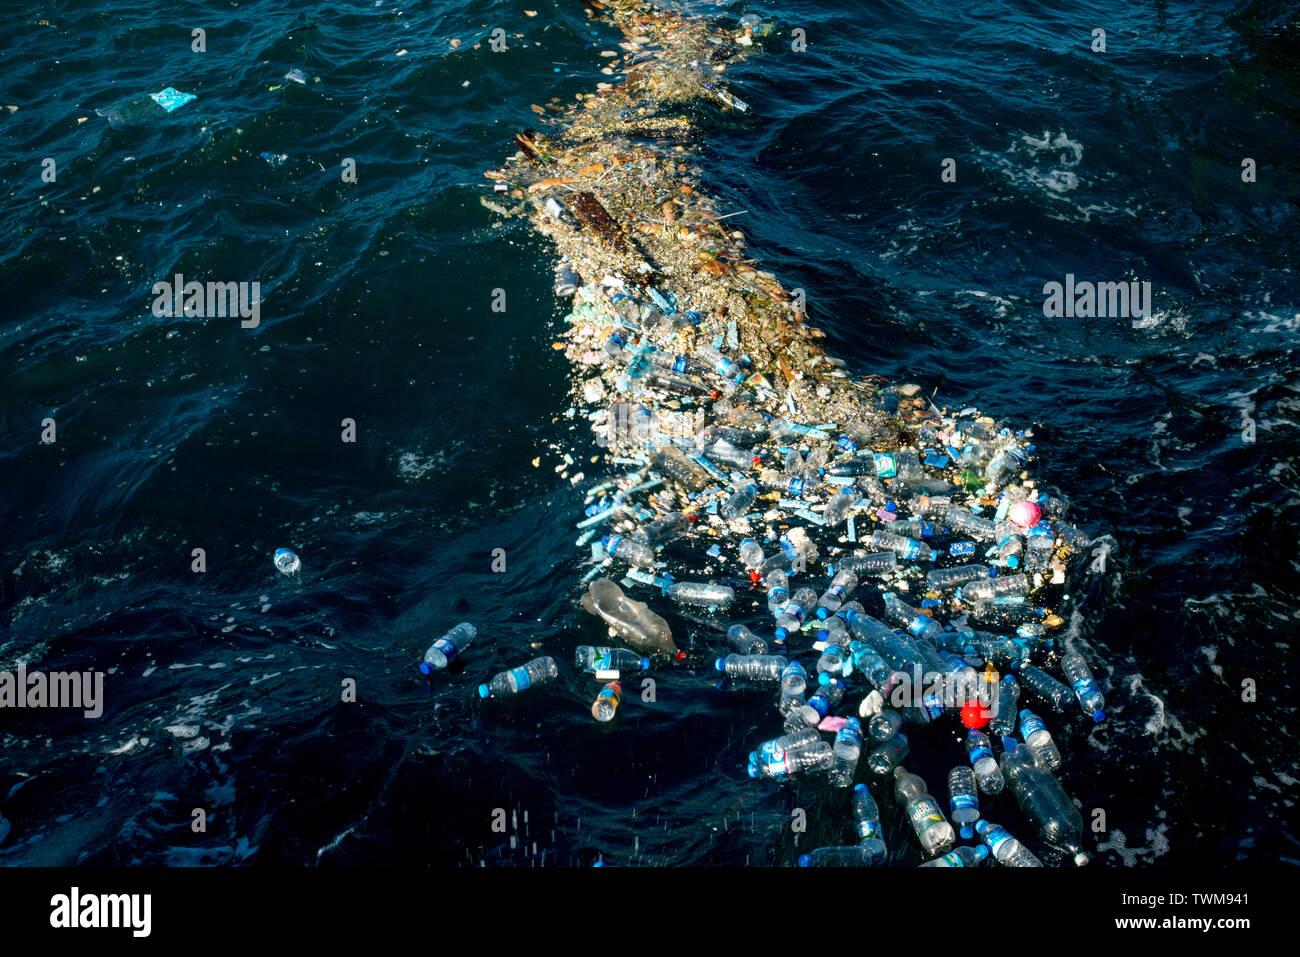 Plastic water bottles pollute ocean - Stock Image